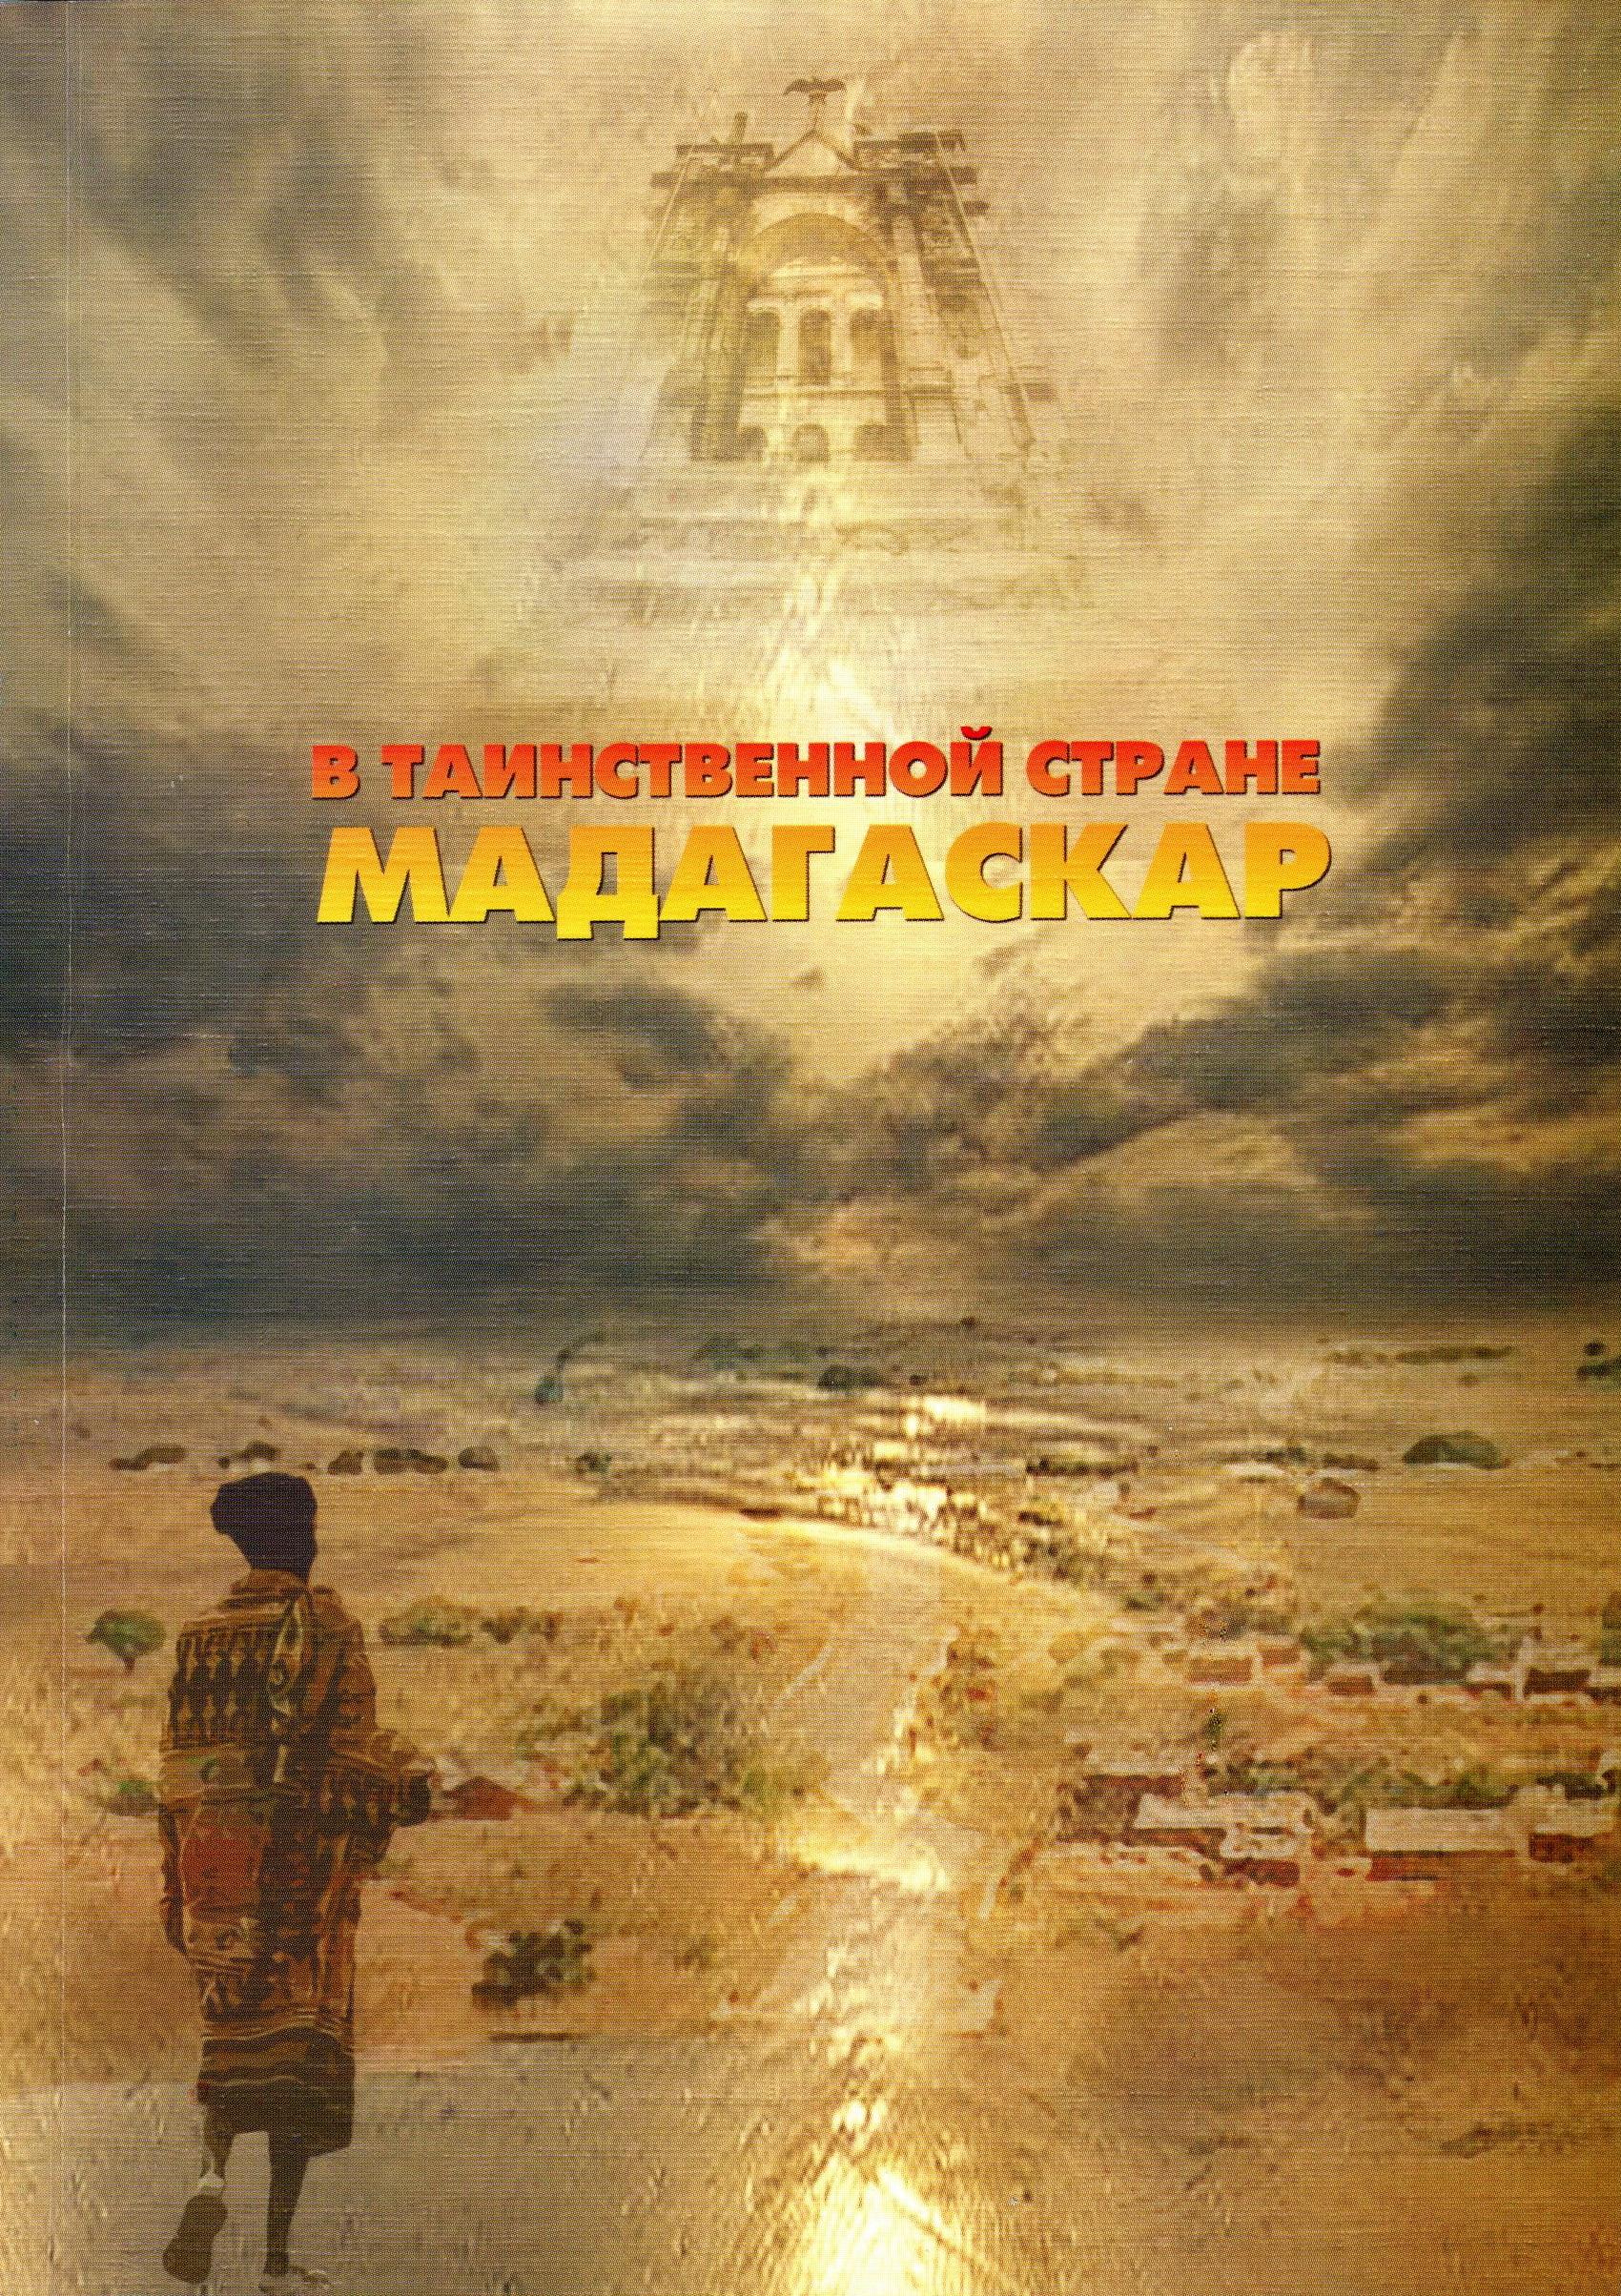 Джозеф Сьюэлл и проблема рабства на Мадагаскаре